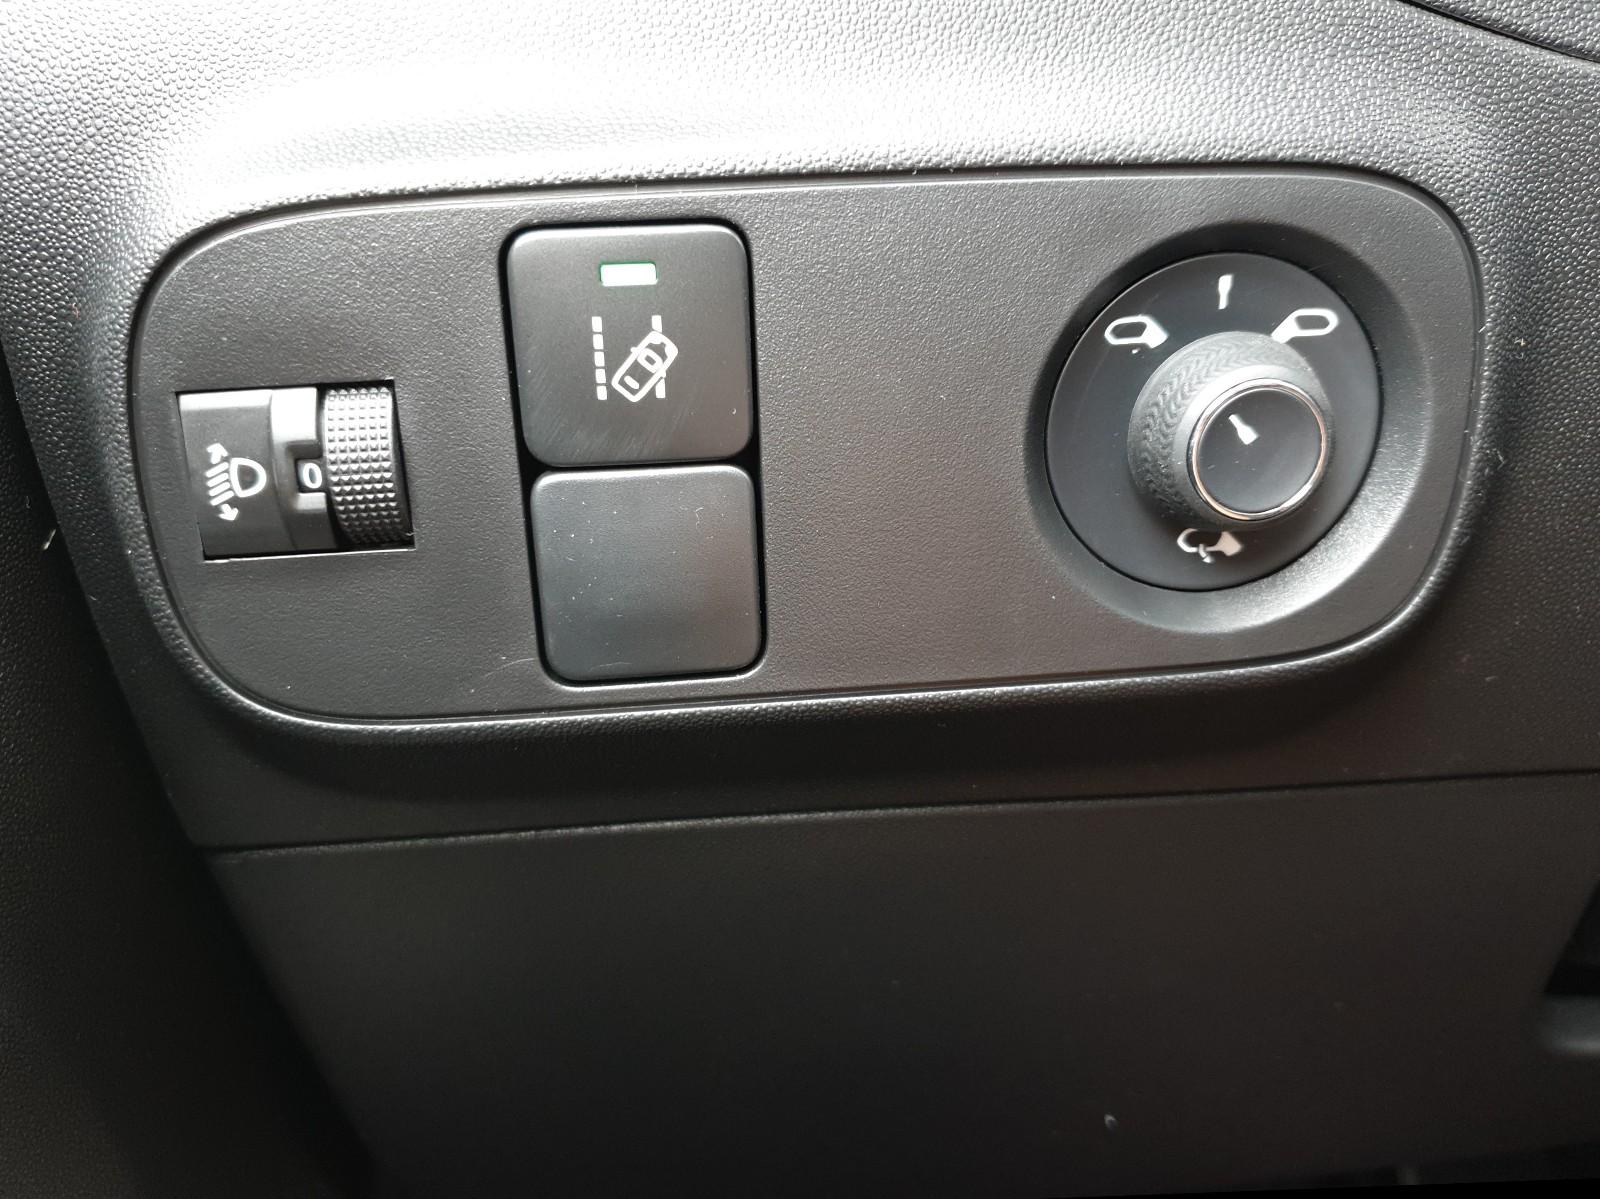 CITROEN C3 1.2 83PS Shine AirBump 5-Türig Klimaautomatik Navi 17''LM PDC Rü Viscaal Fahrzeuggrosshandel GmbH, D-49847 Itterbeck